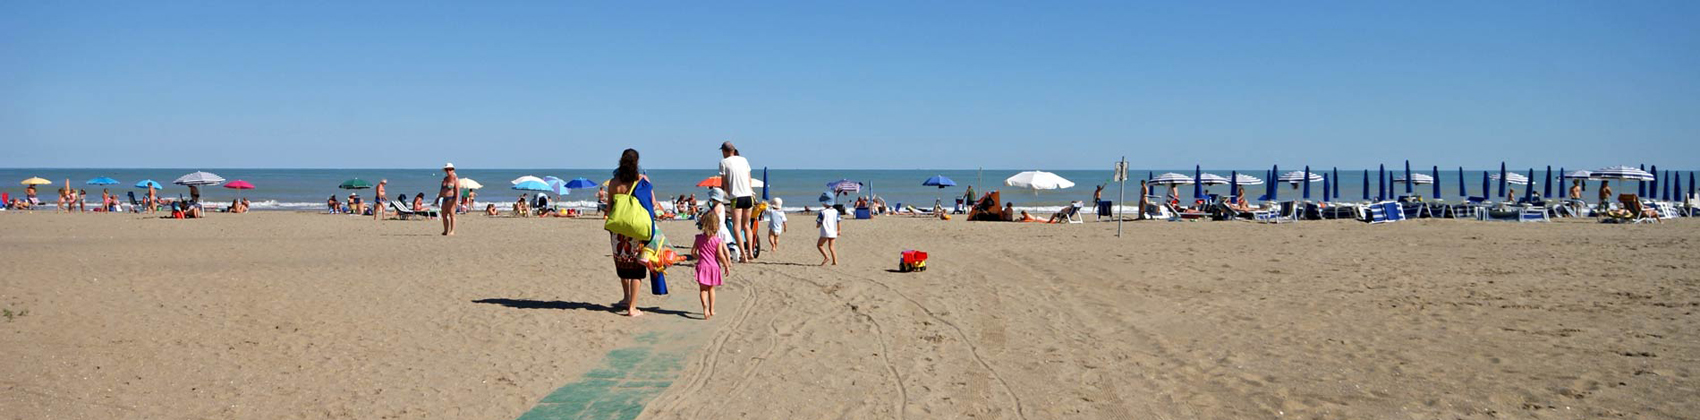 Slider_Spiaggia_2